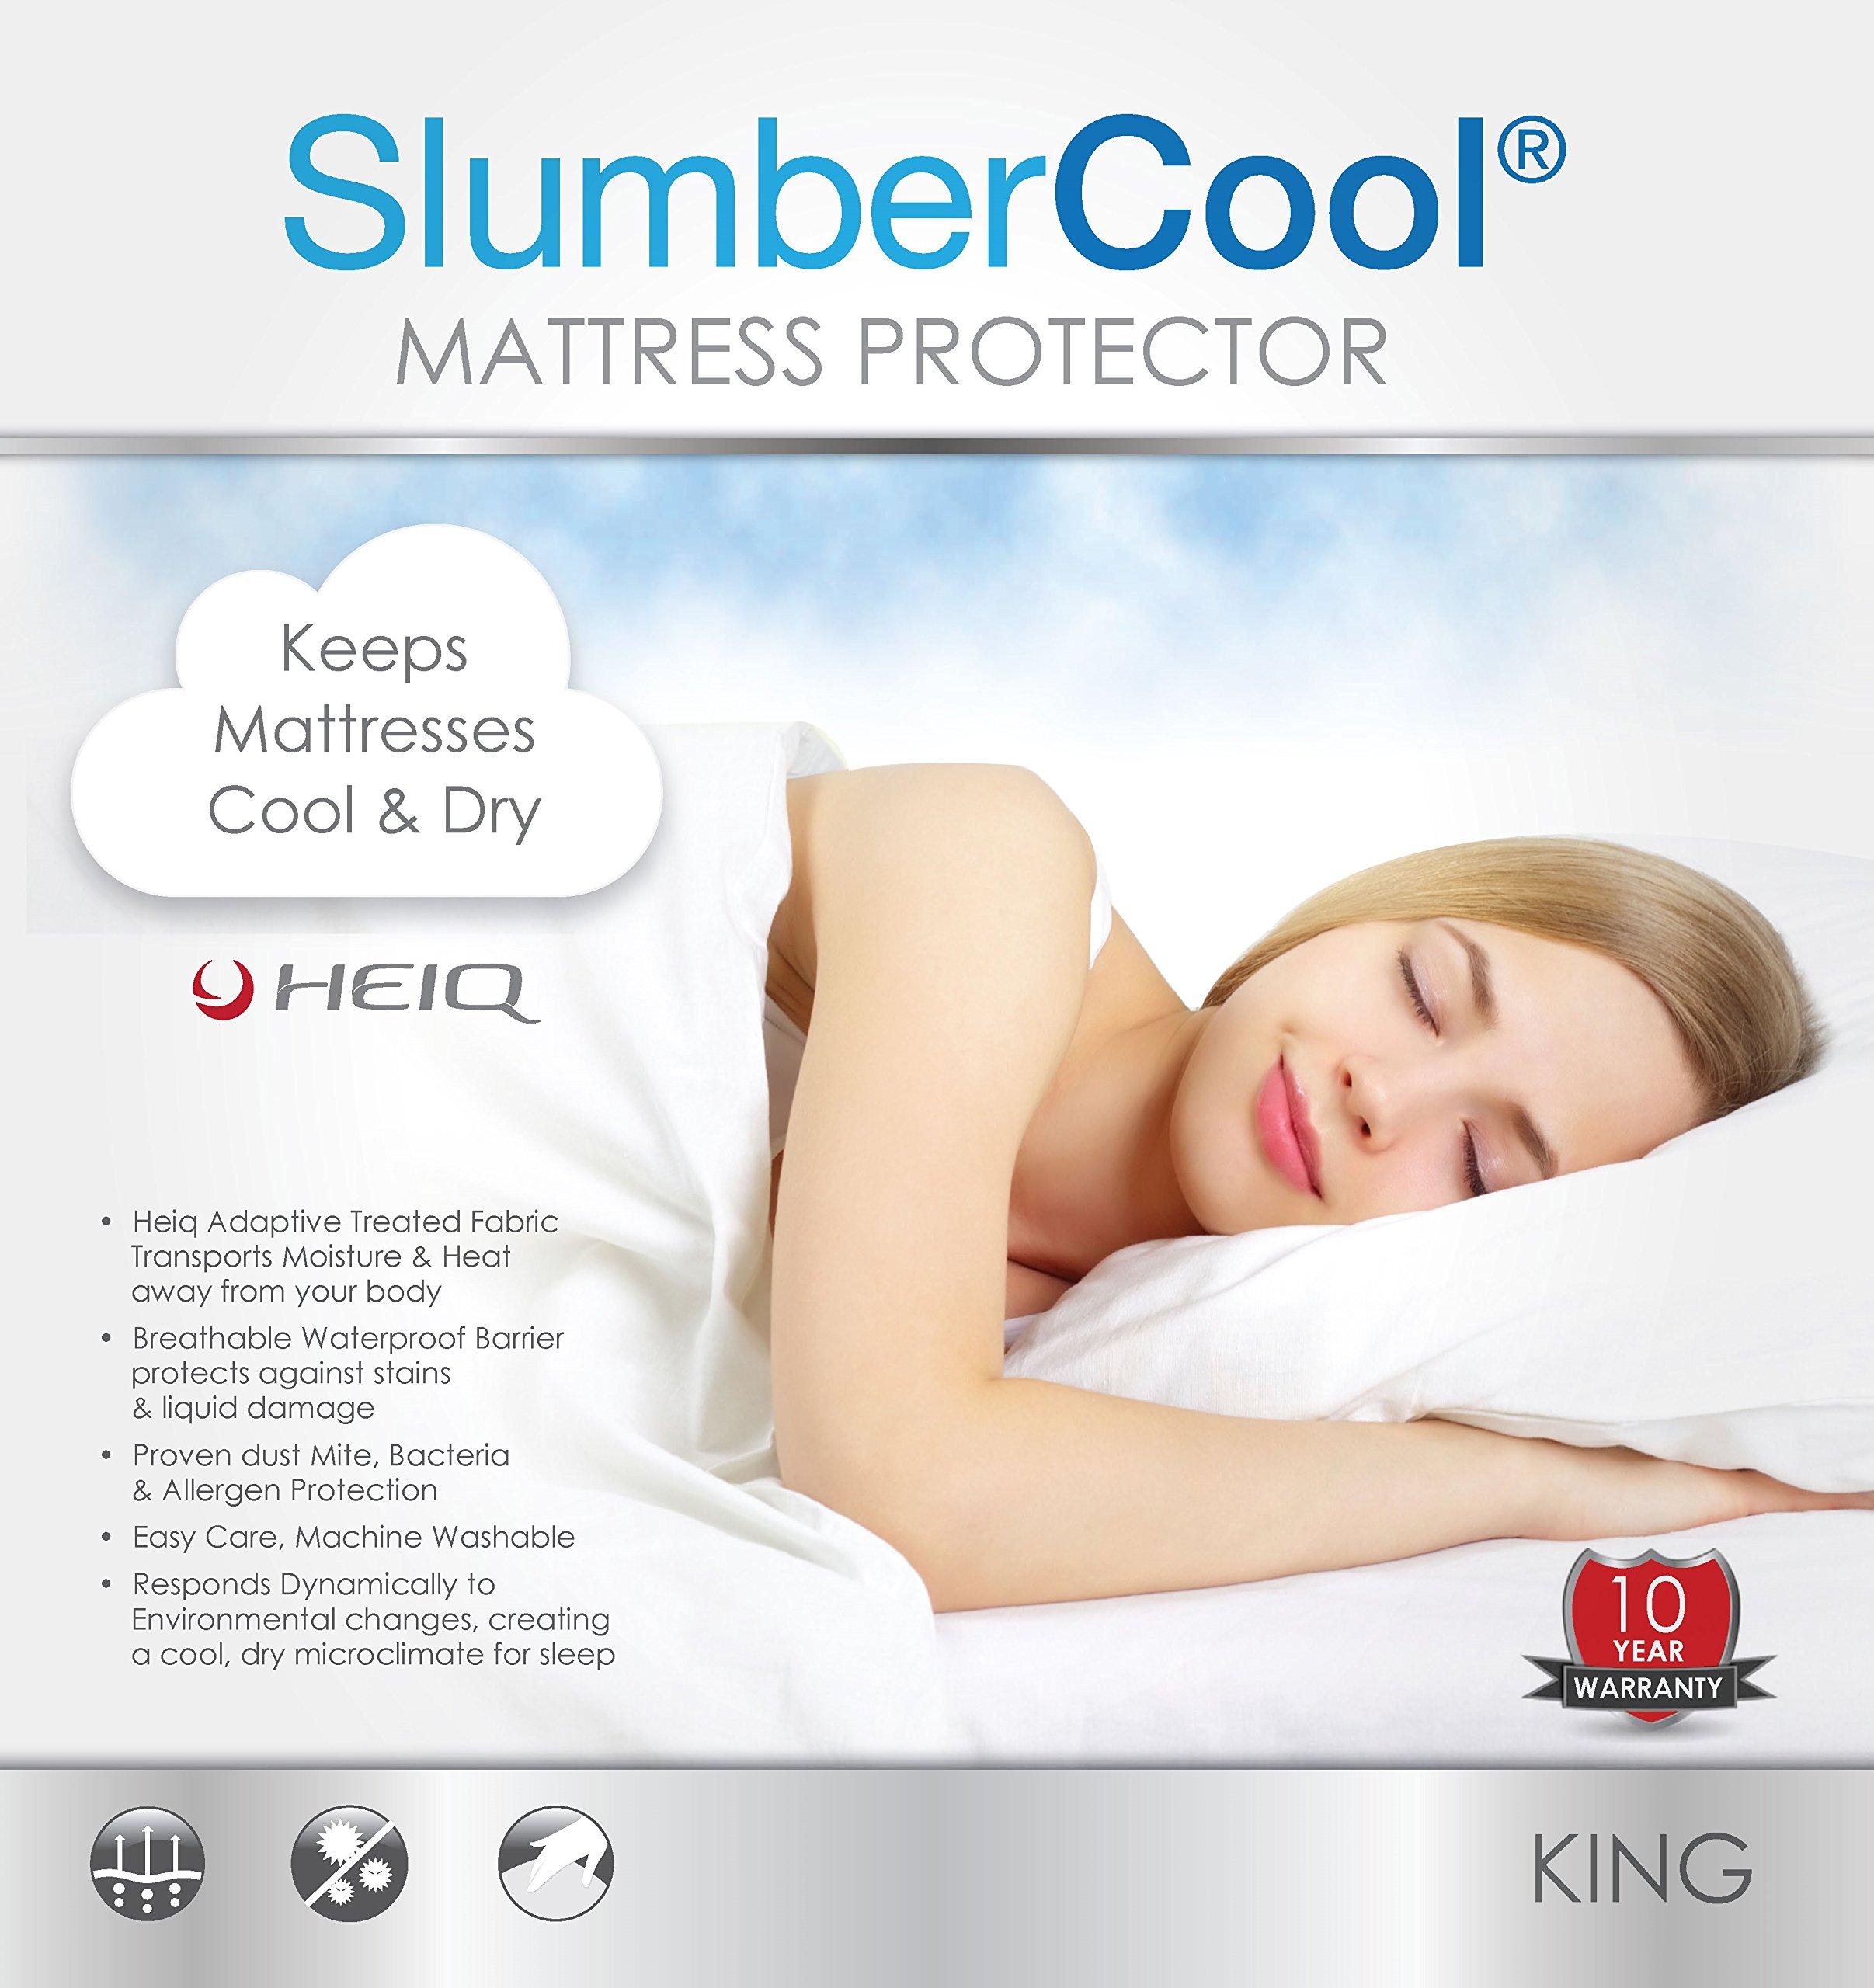 Slumbercool Mattress Protector, King